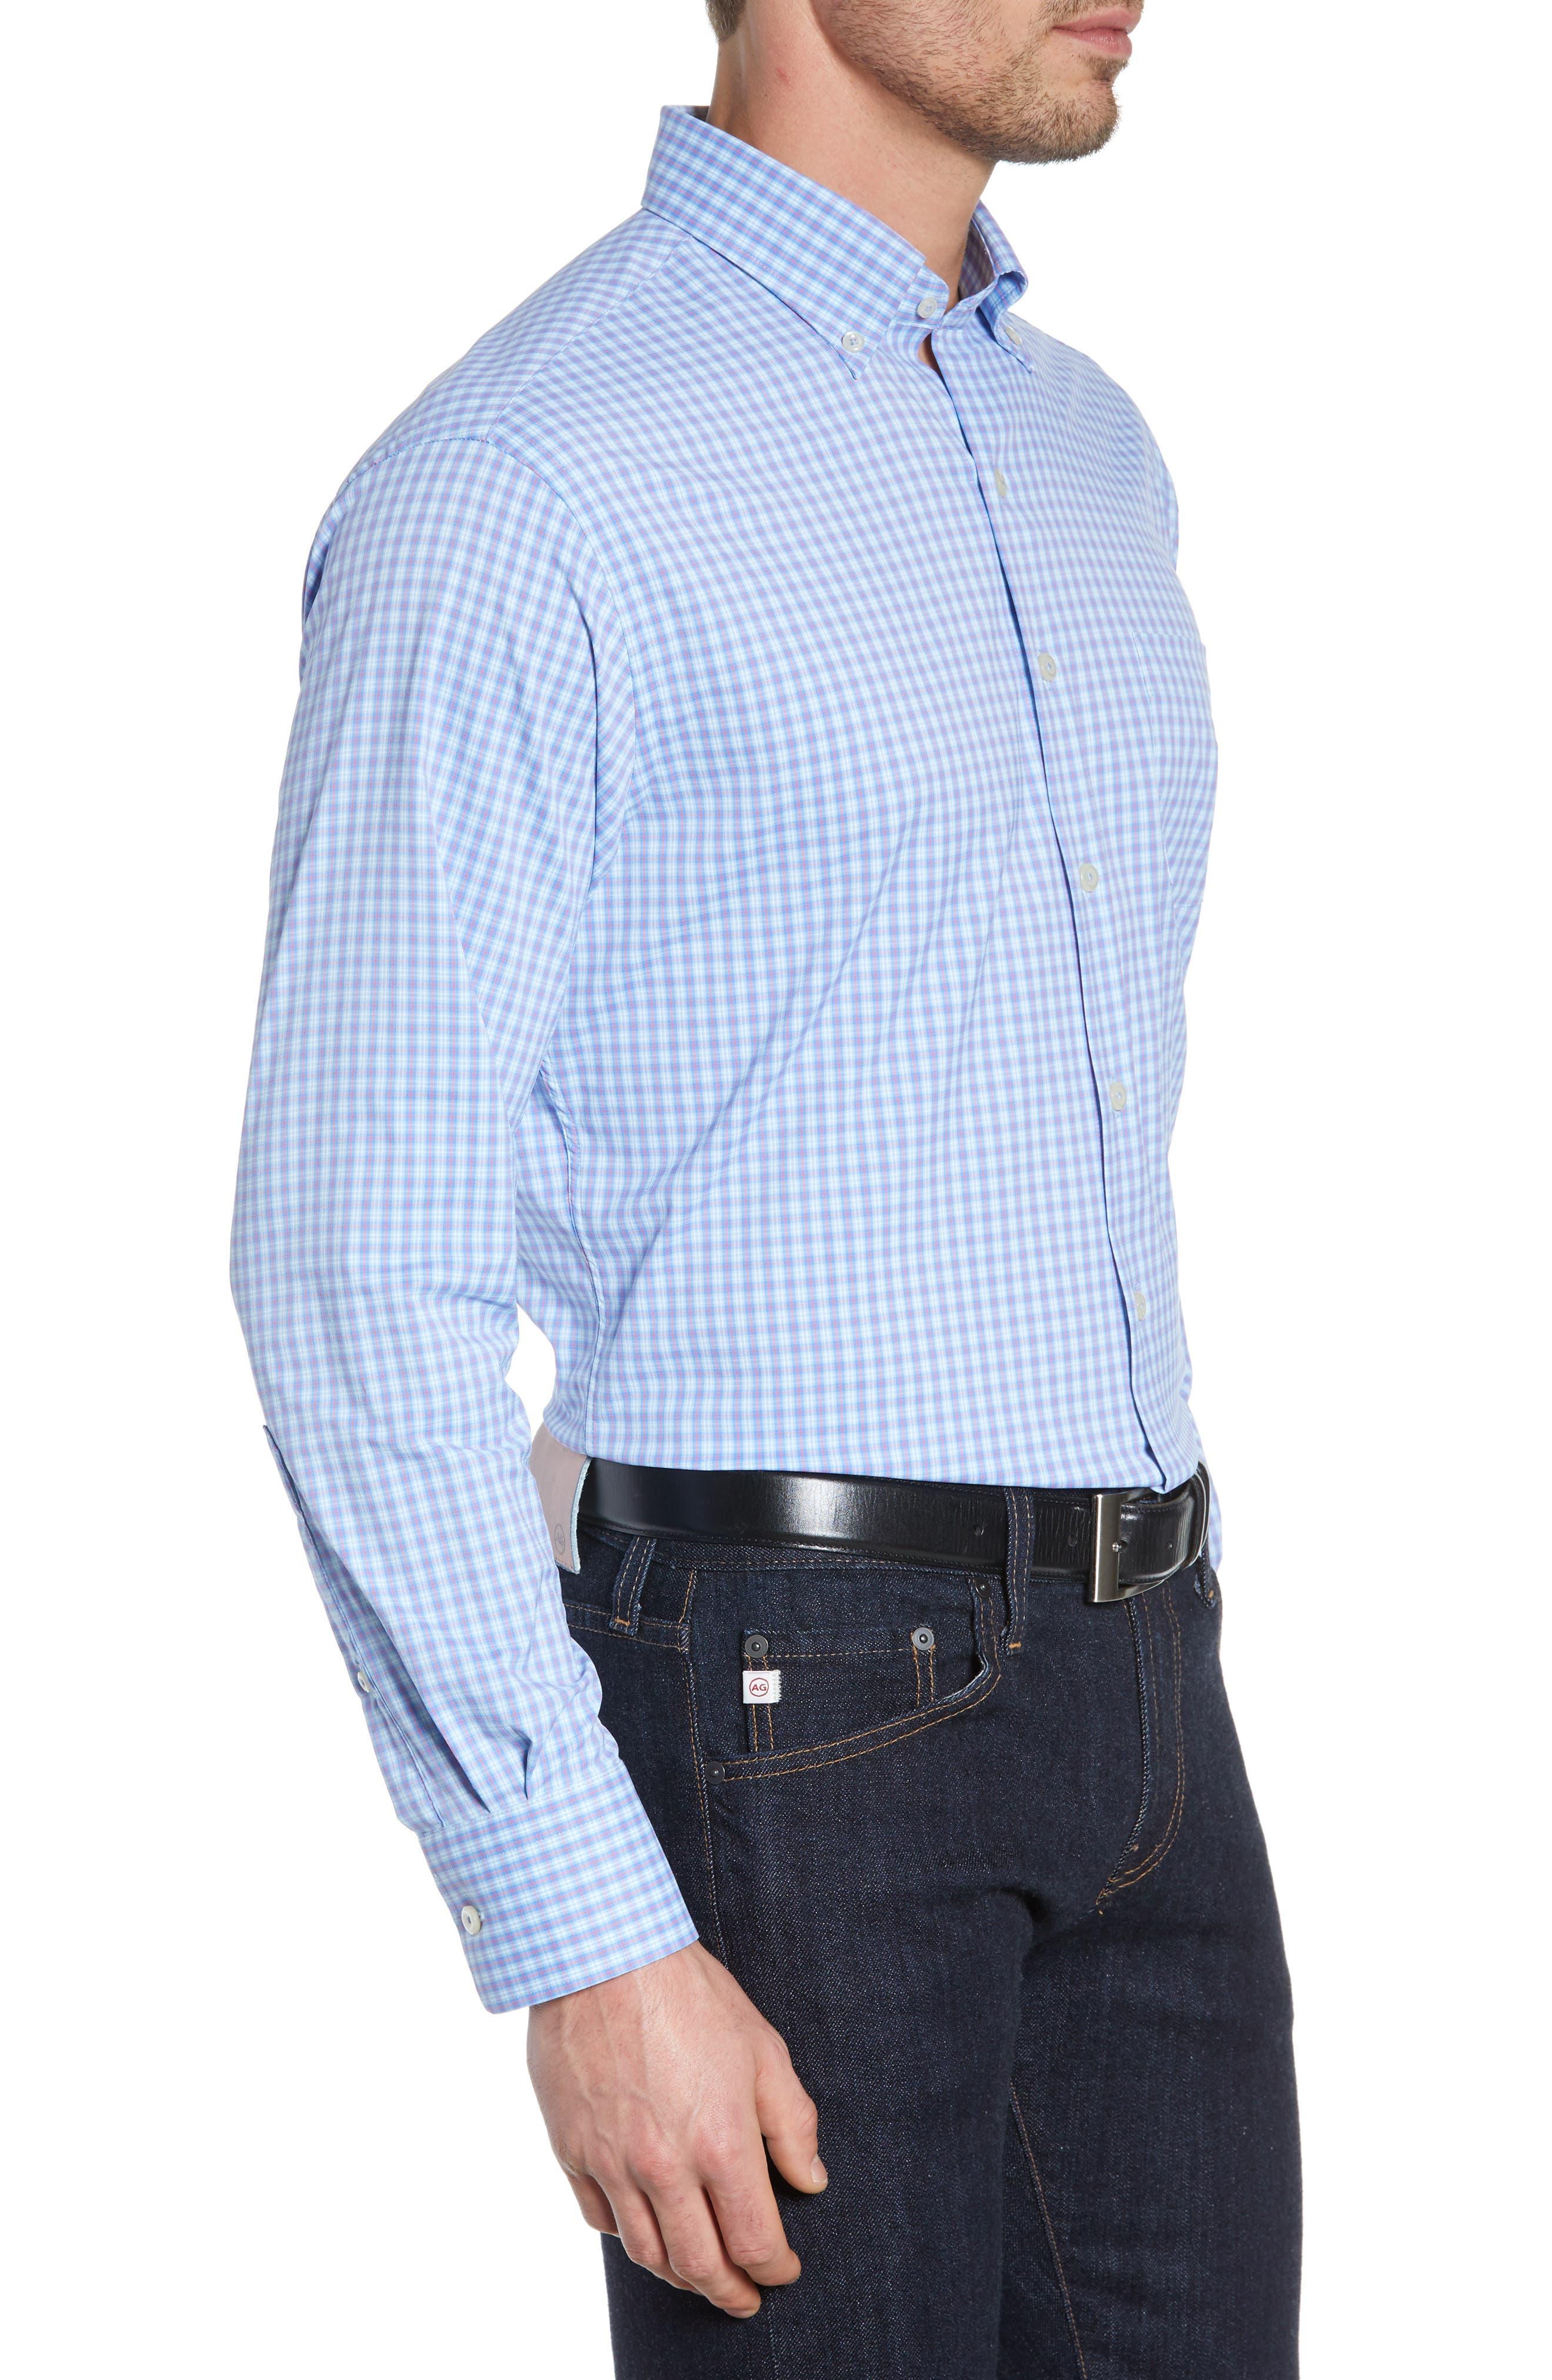 PETER MILLAR, Hawkins Plaid Performance Sport Shirt, Alternate thumbnail 4, color, VESSEL